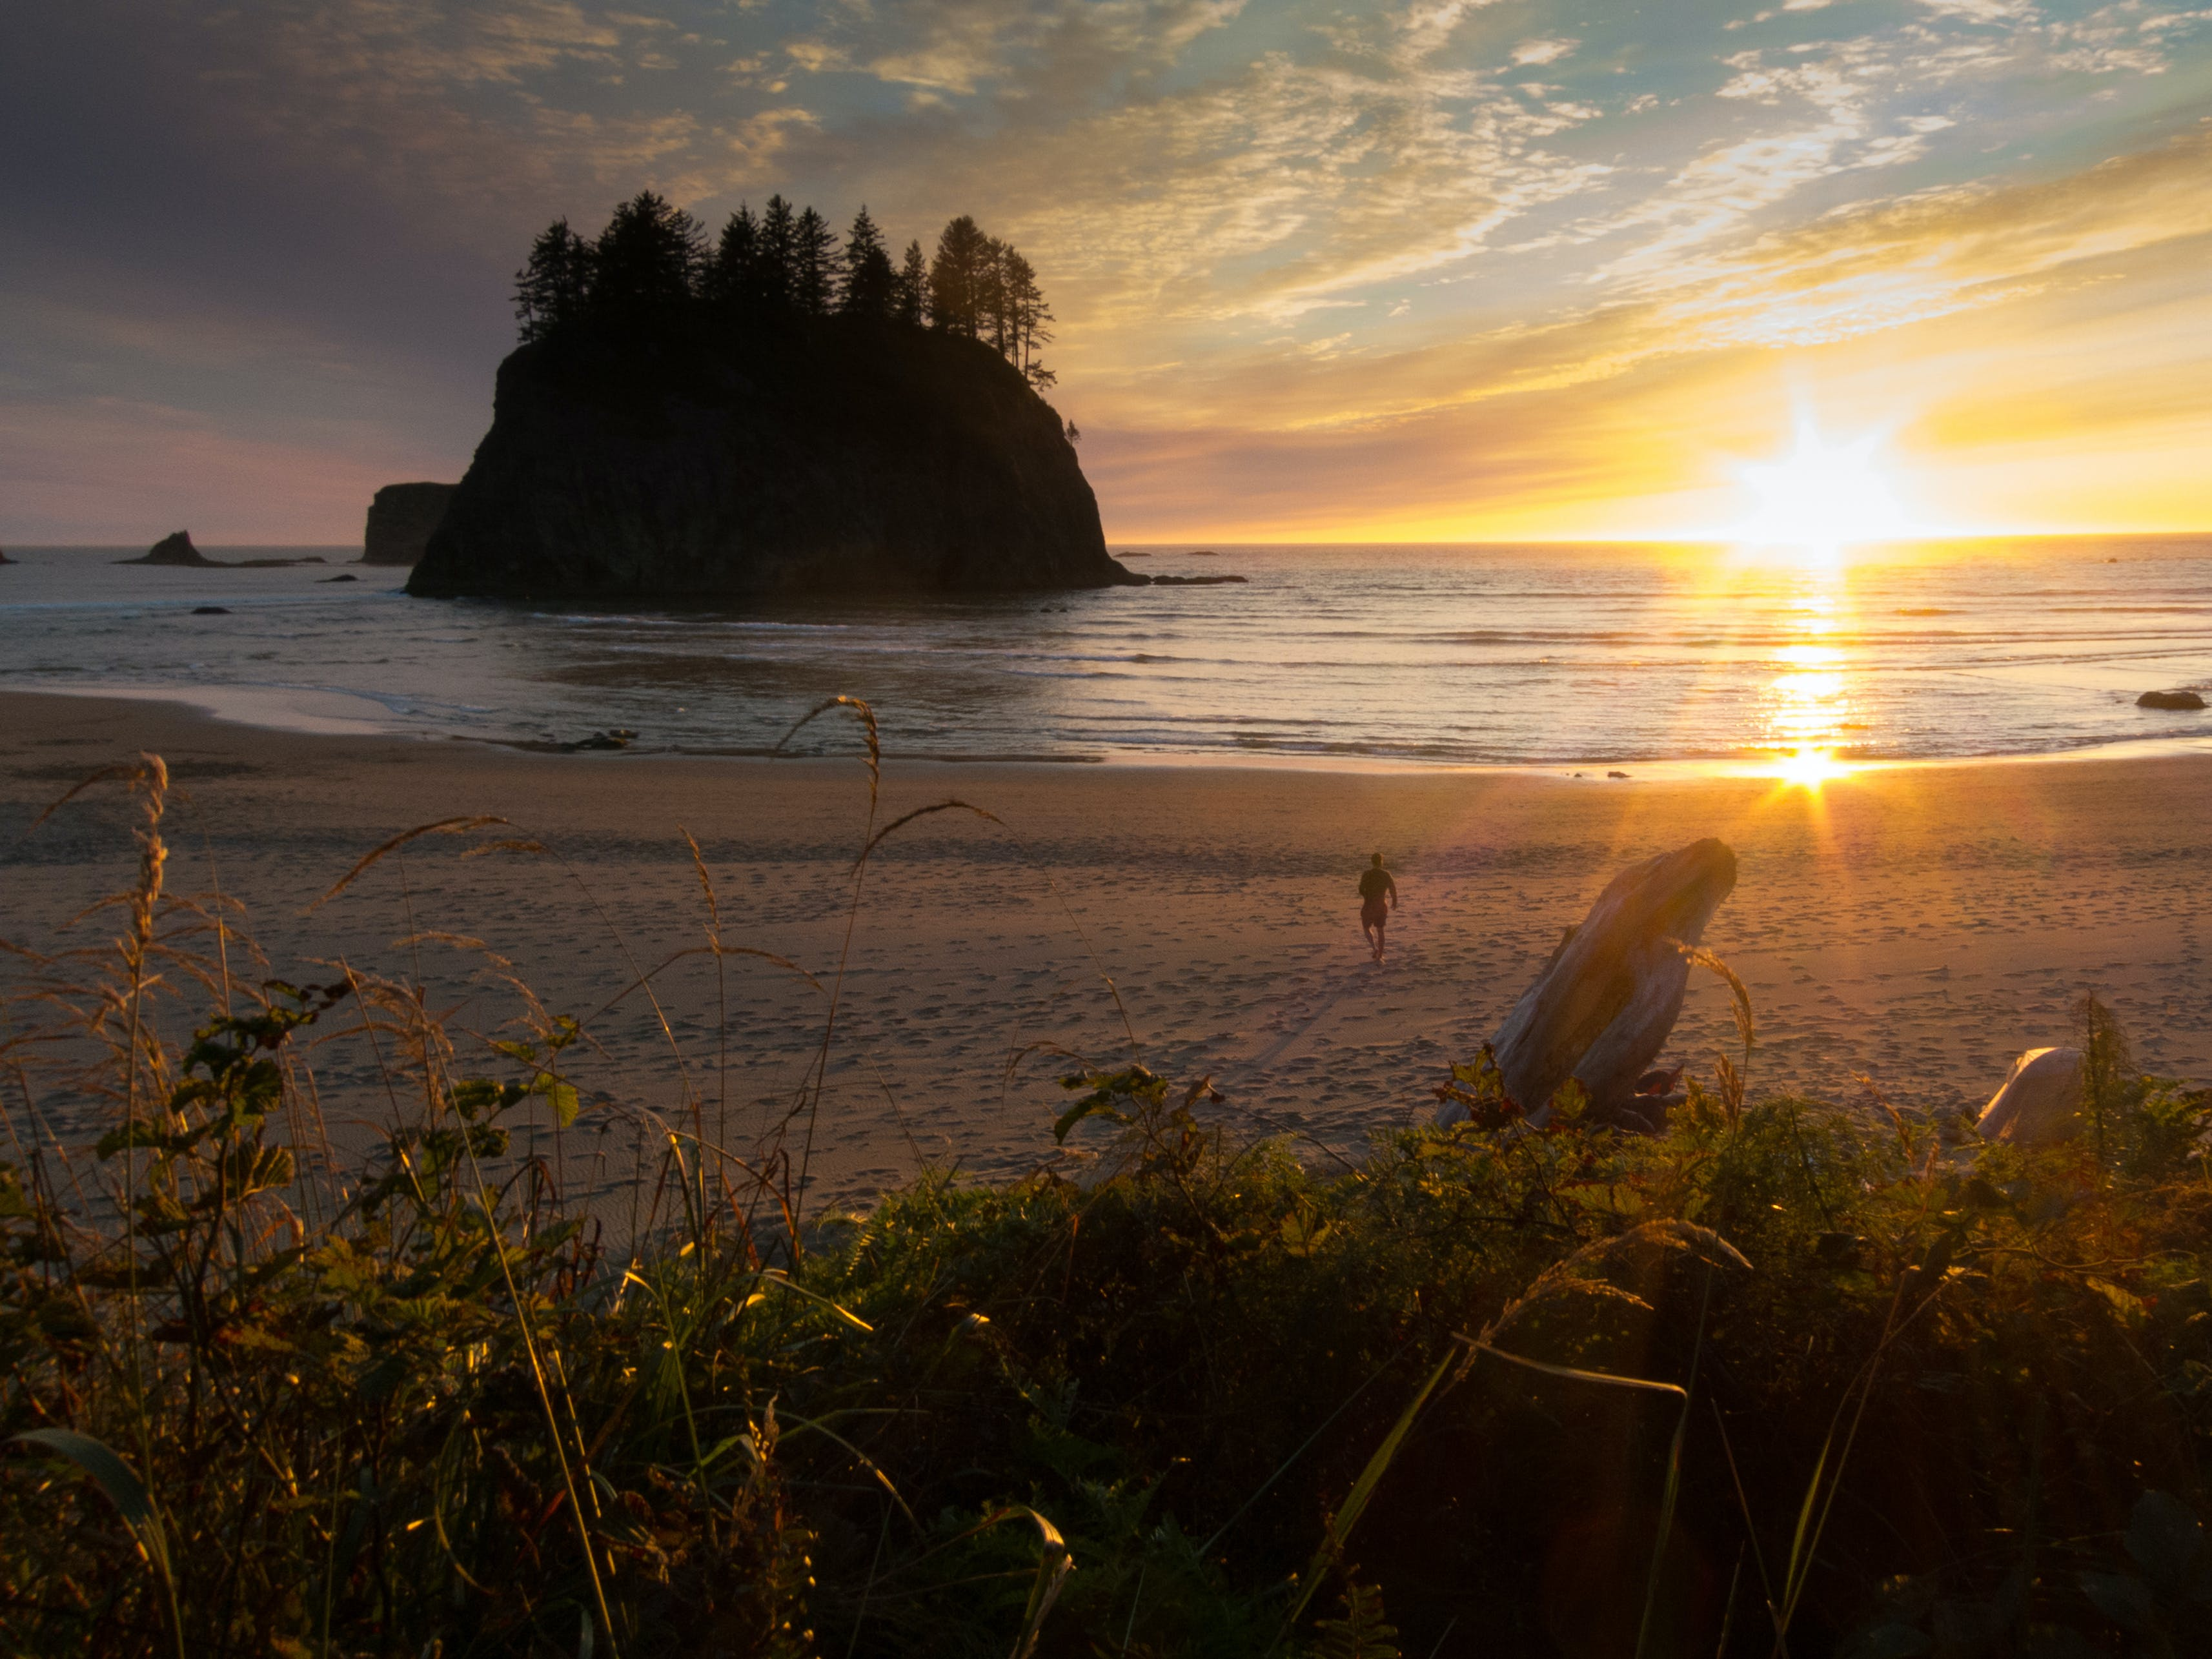 Free stock photo of sunset, pacific beach